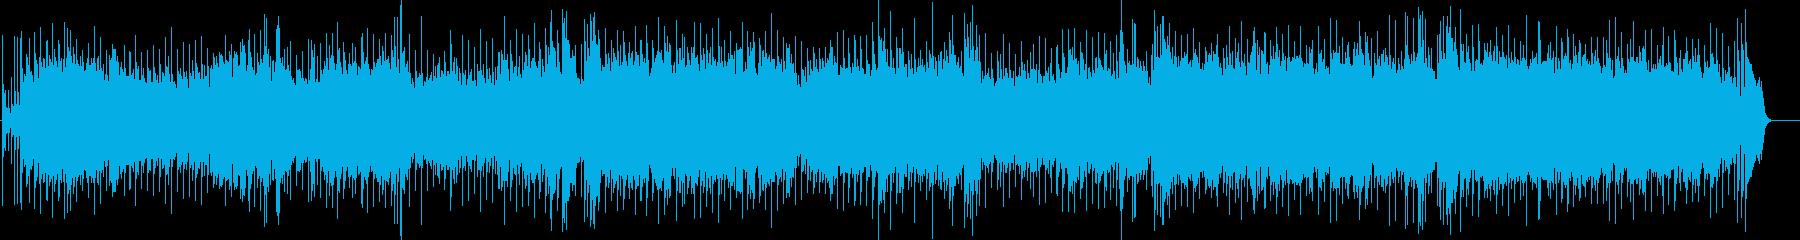 HRフュージョン 80sアクションRPGの再生済みの波形